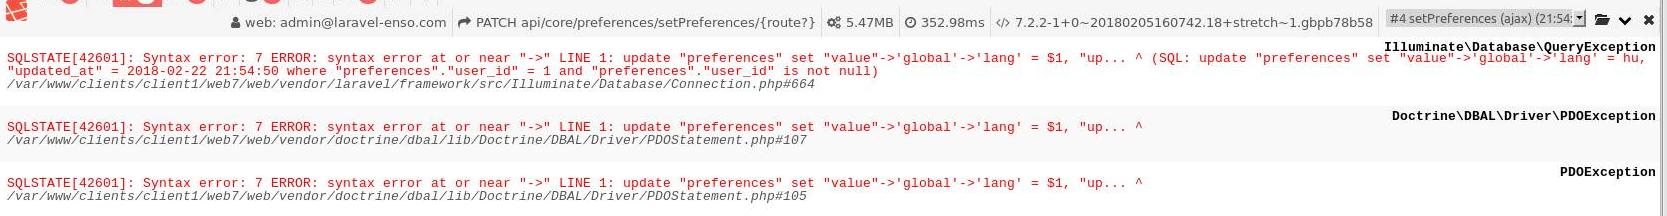 Updating JSON field in Postgresql, user's preferences · Issue #50